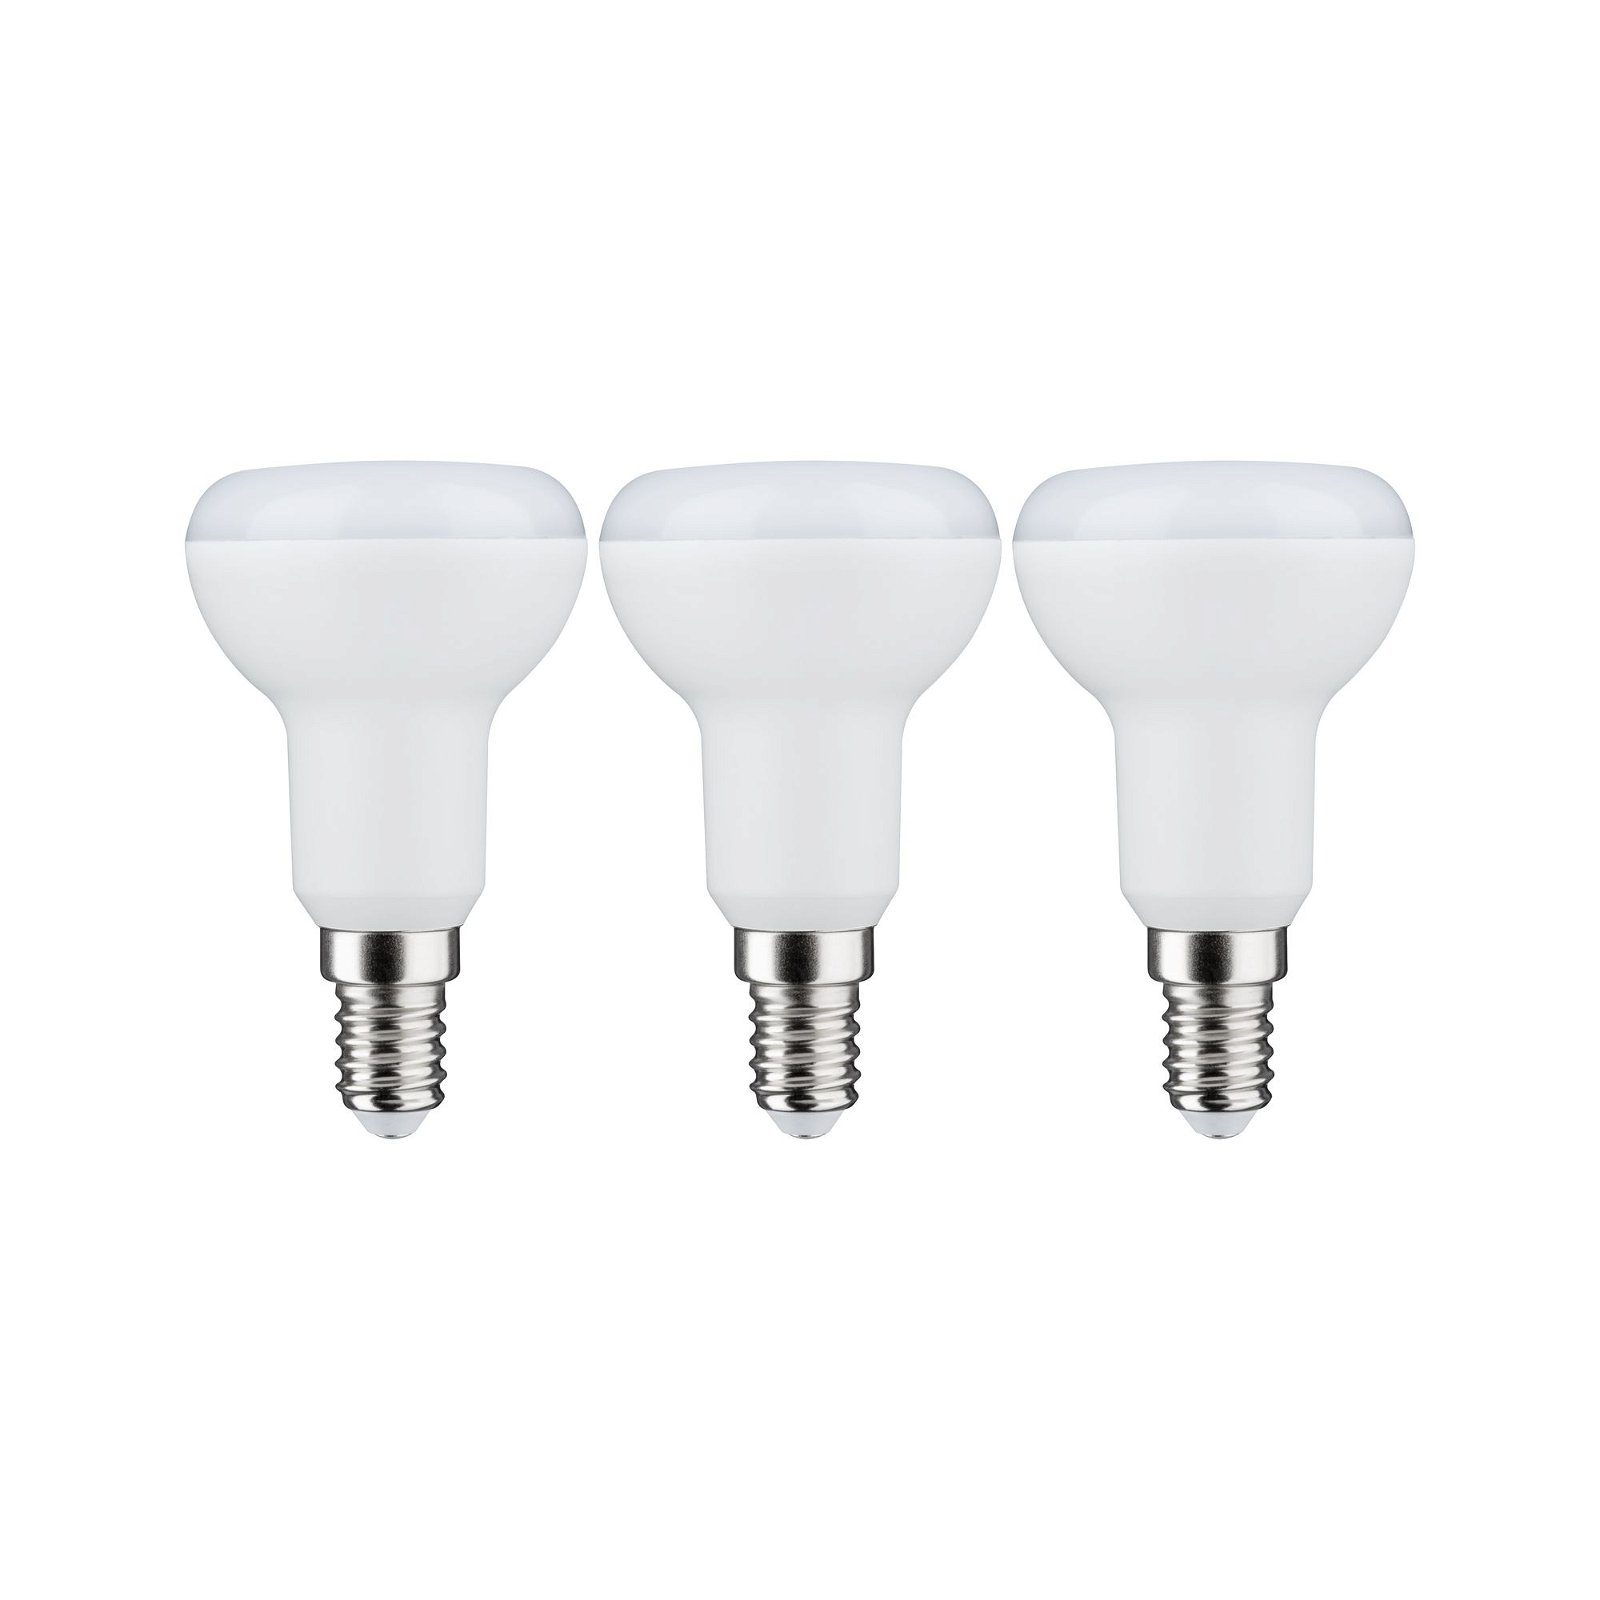 LED Reflektor E14 230V 3x450lm 3x5,5W 2700K Opal